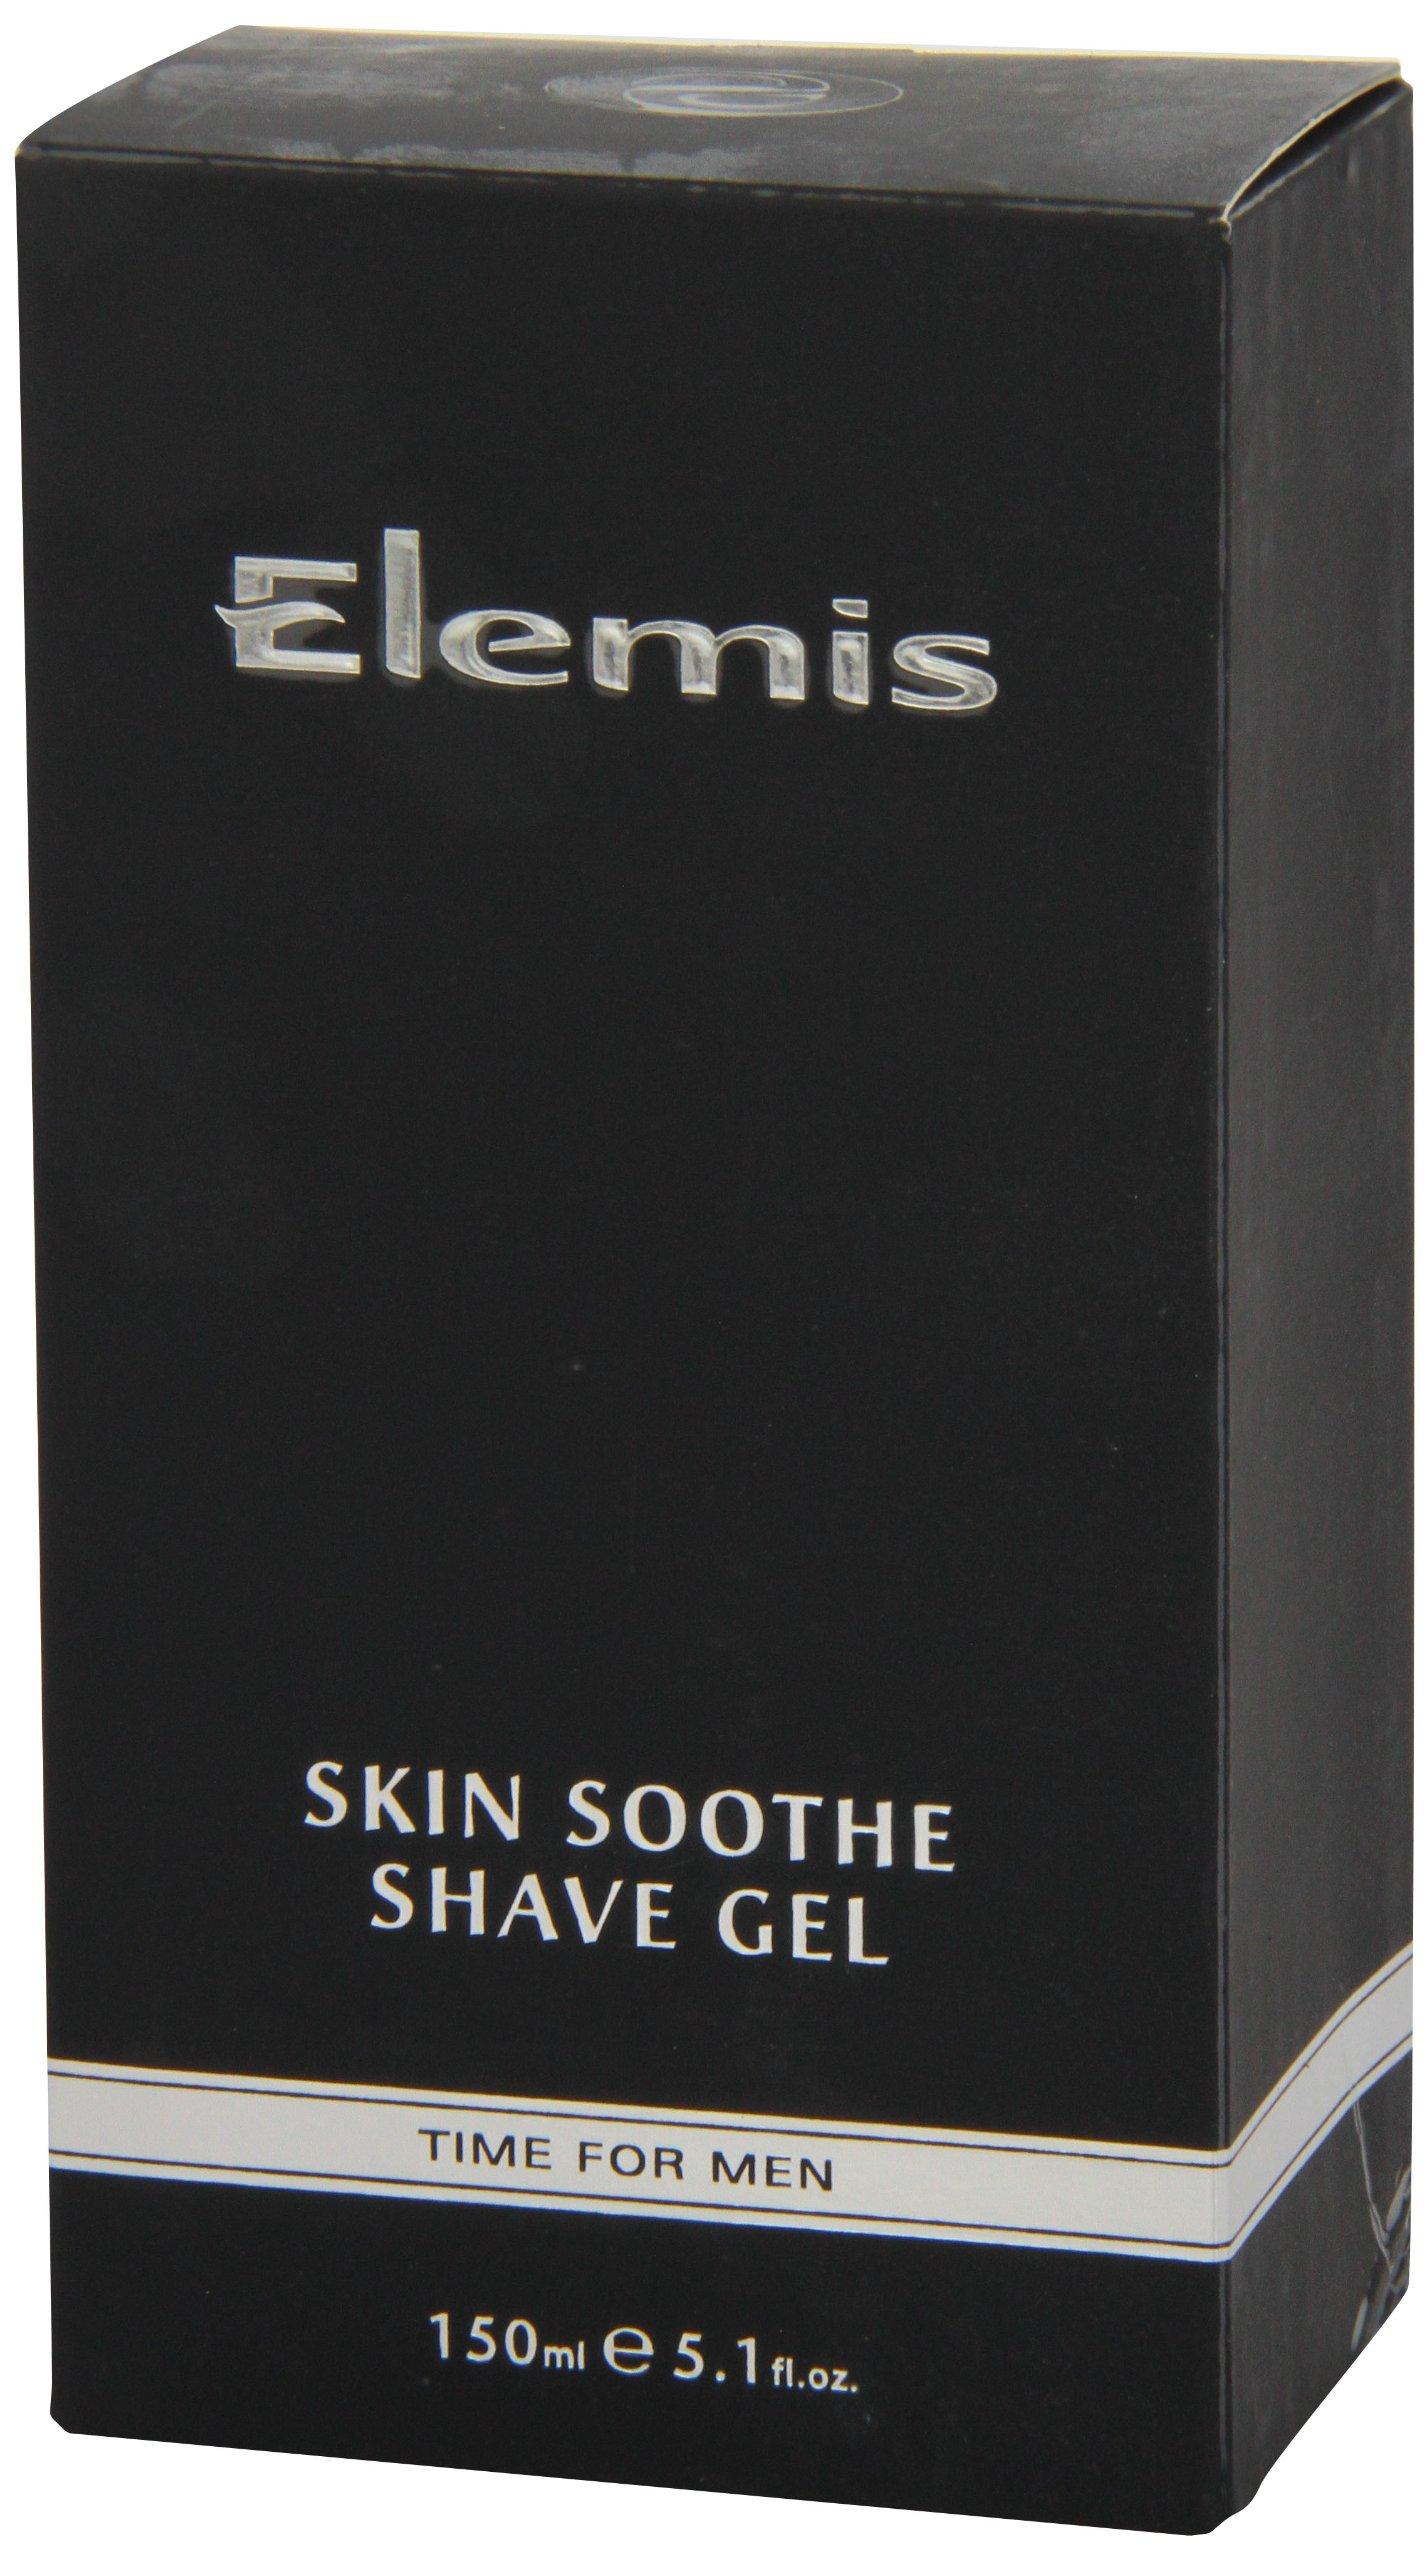 ELEMIS Skin Soothe Shave Gel, Soothing Shave Gel, 5.0 fl. oz. by ELEMIS